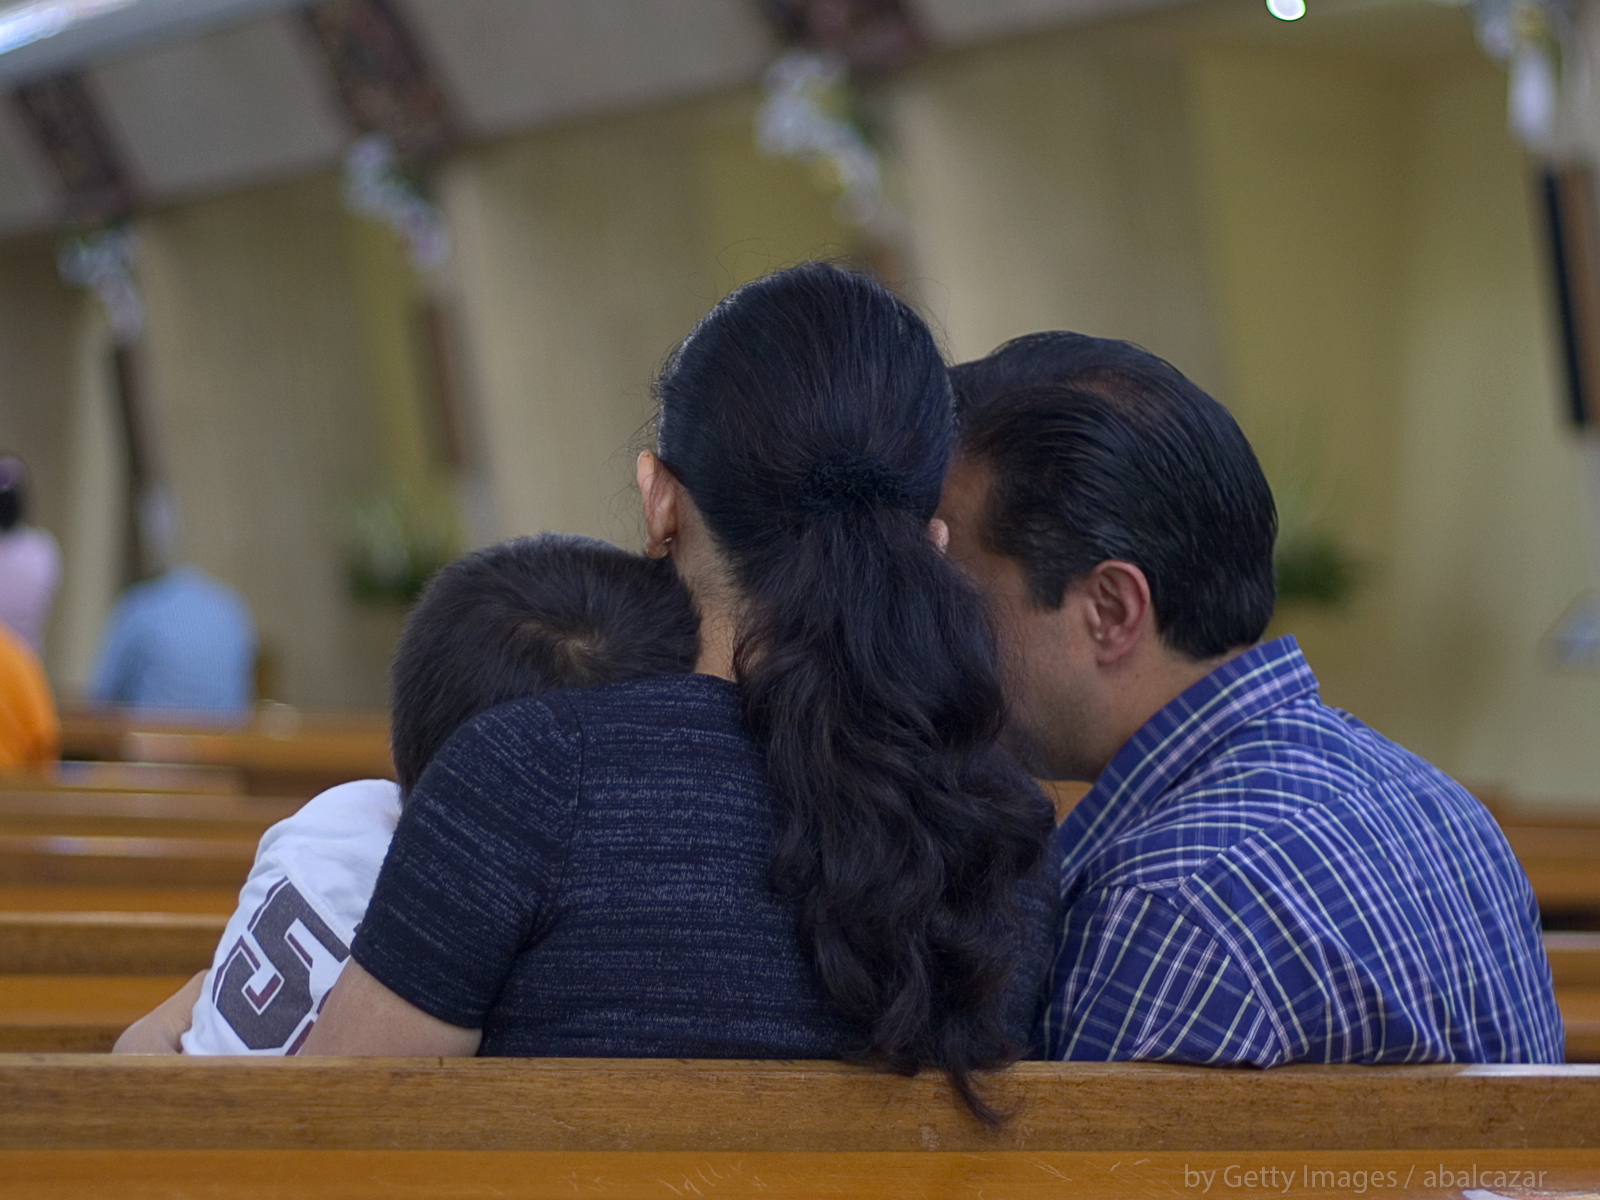 Os benefícios da mãe eucarística e adoradora